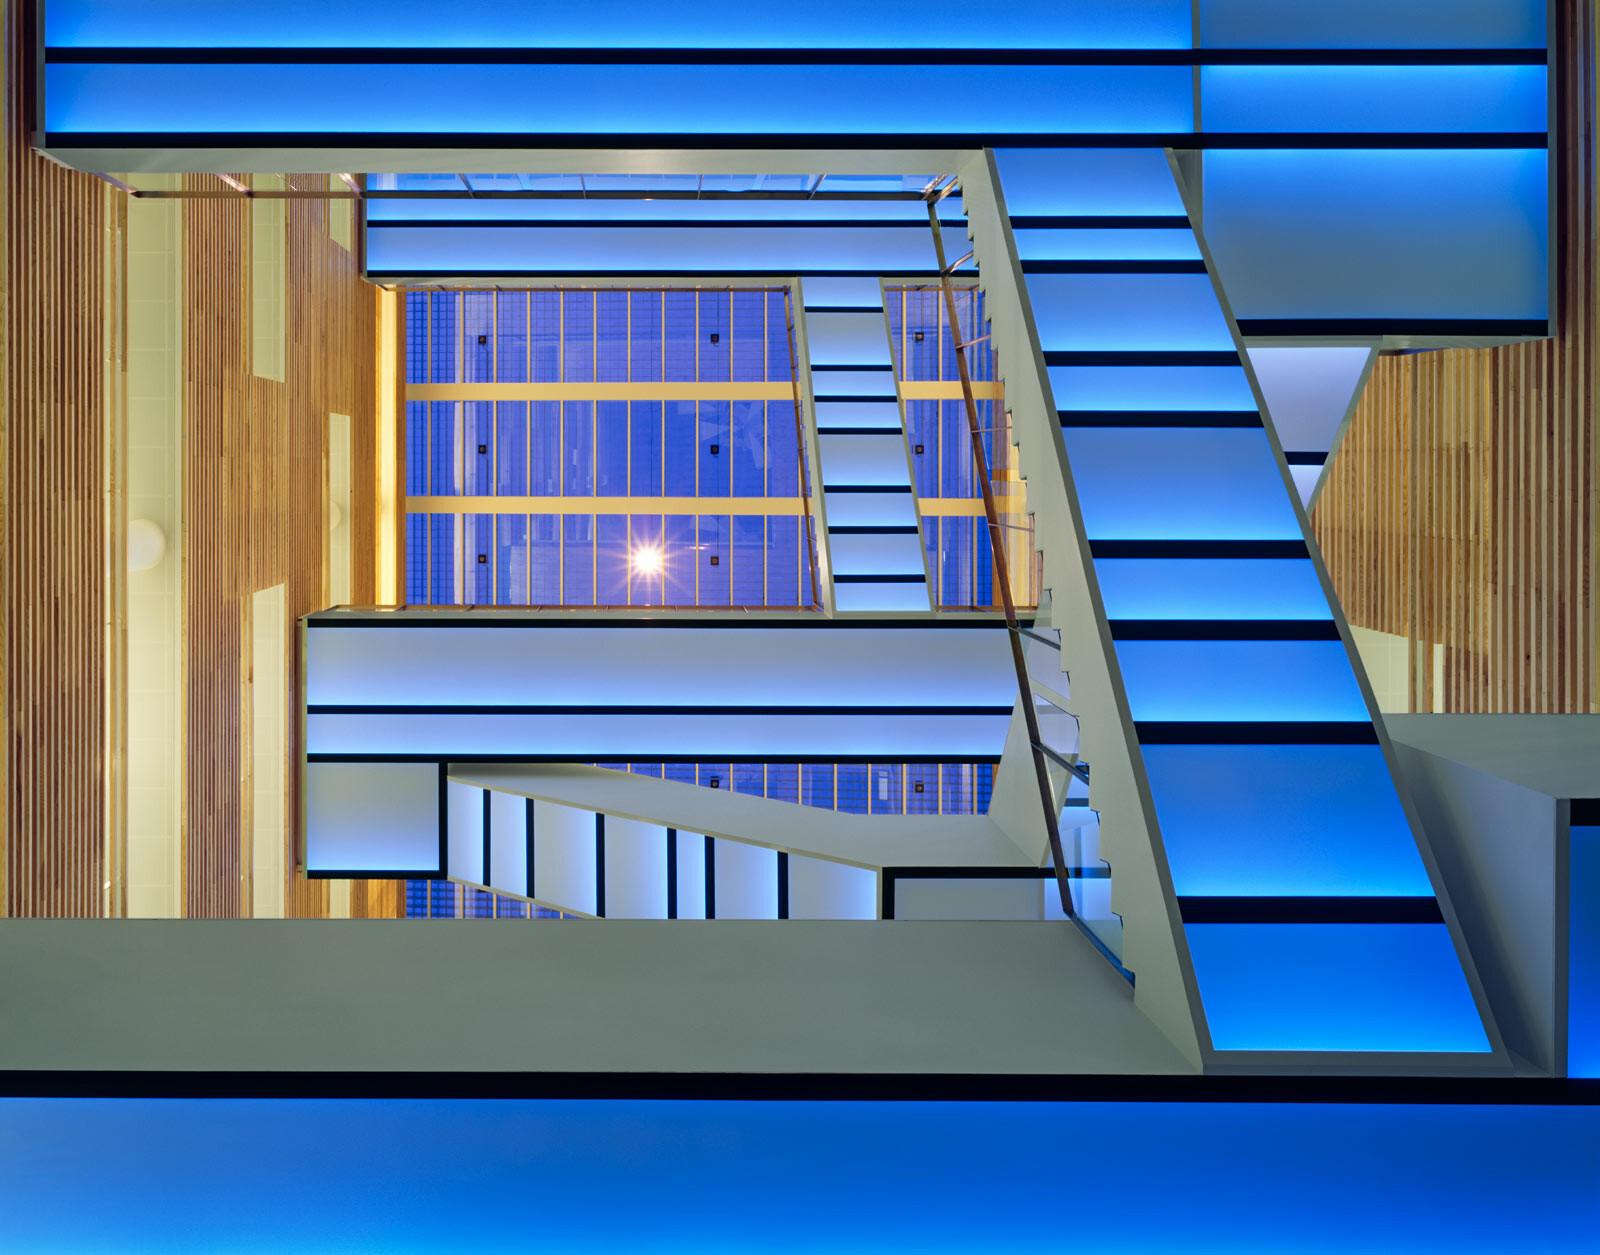 Staircase blue - Adam Mørk